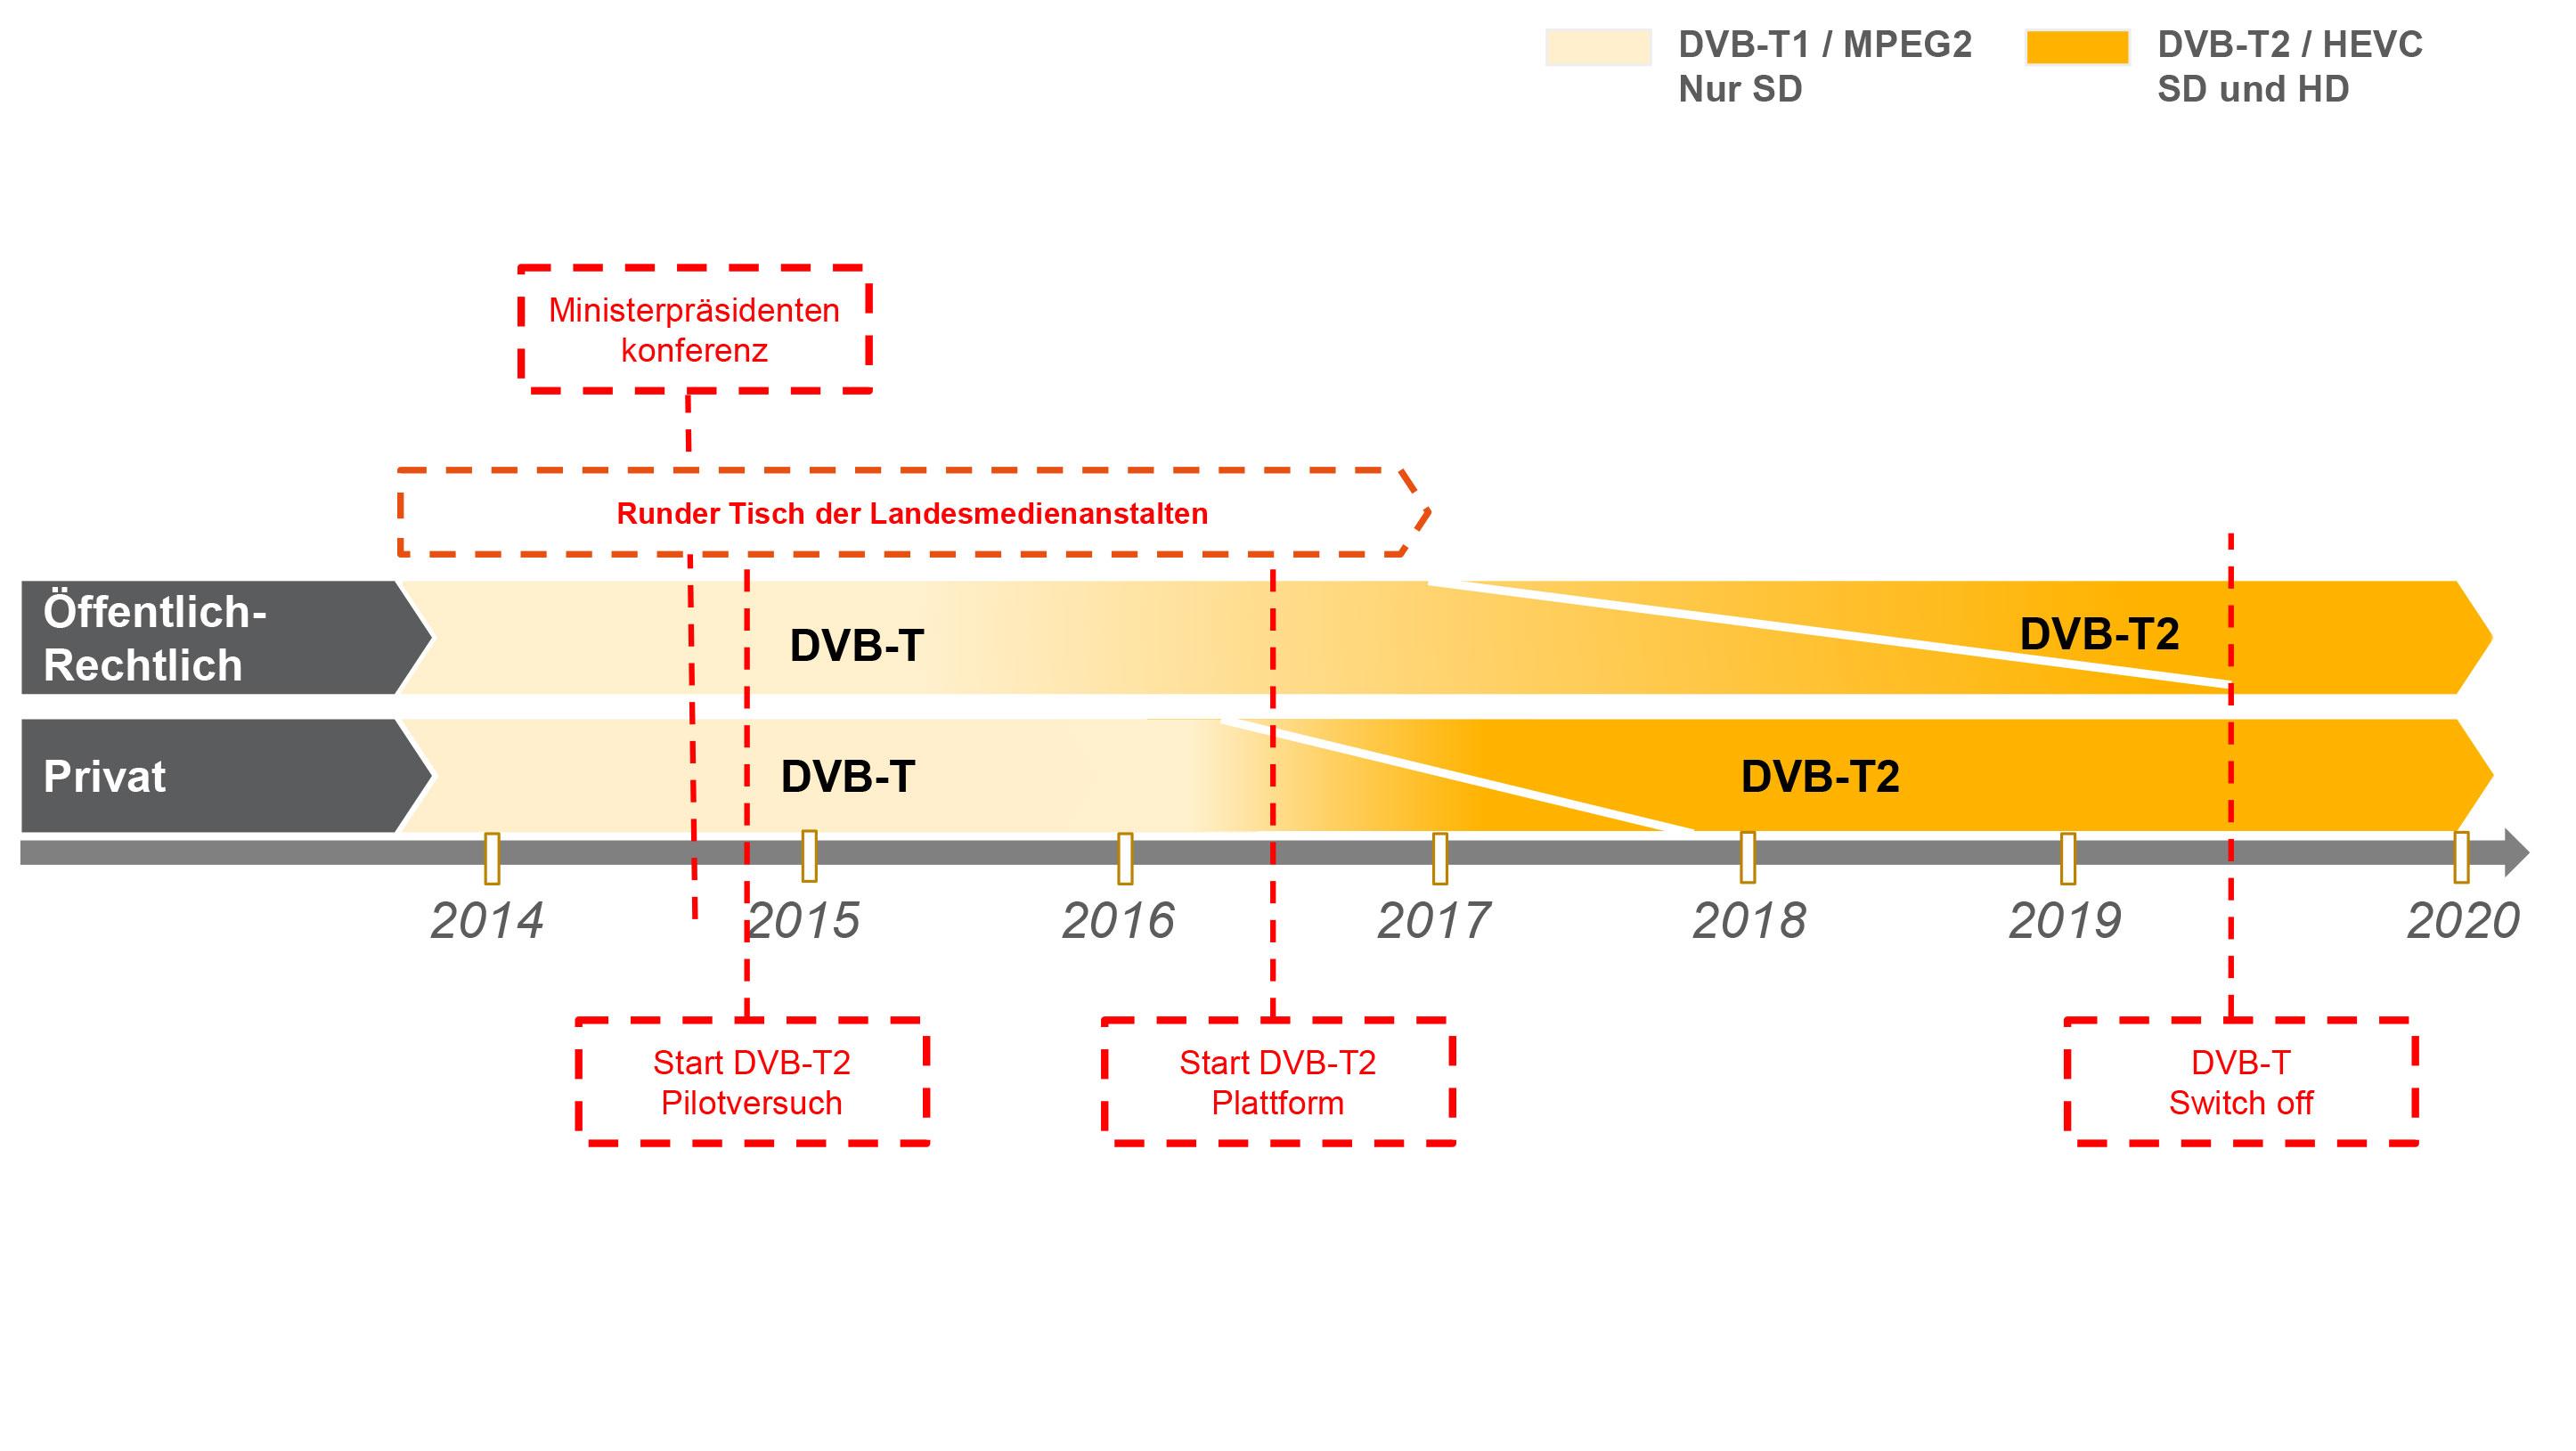 B_1114_DVB_B_7